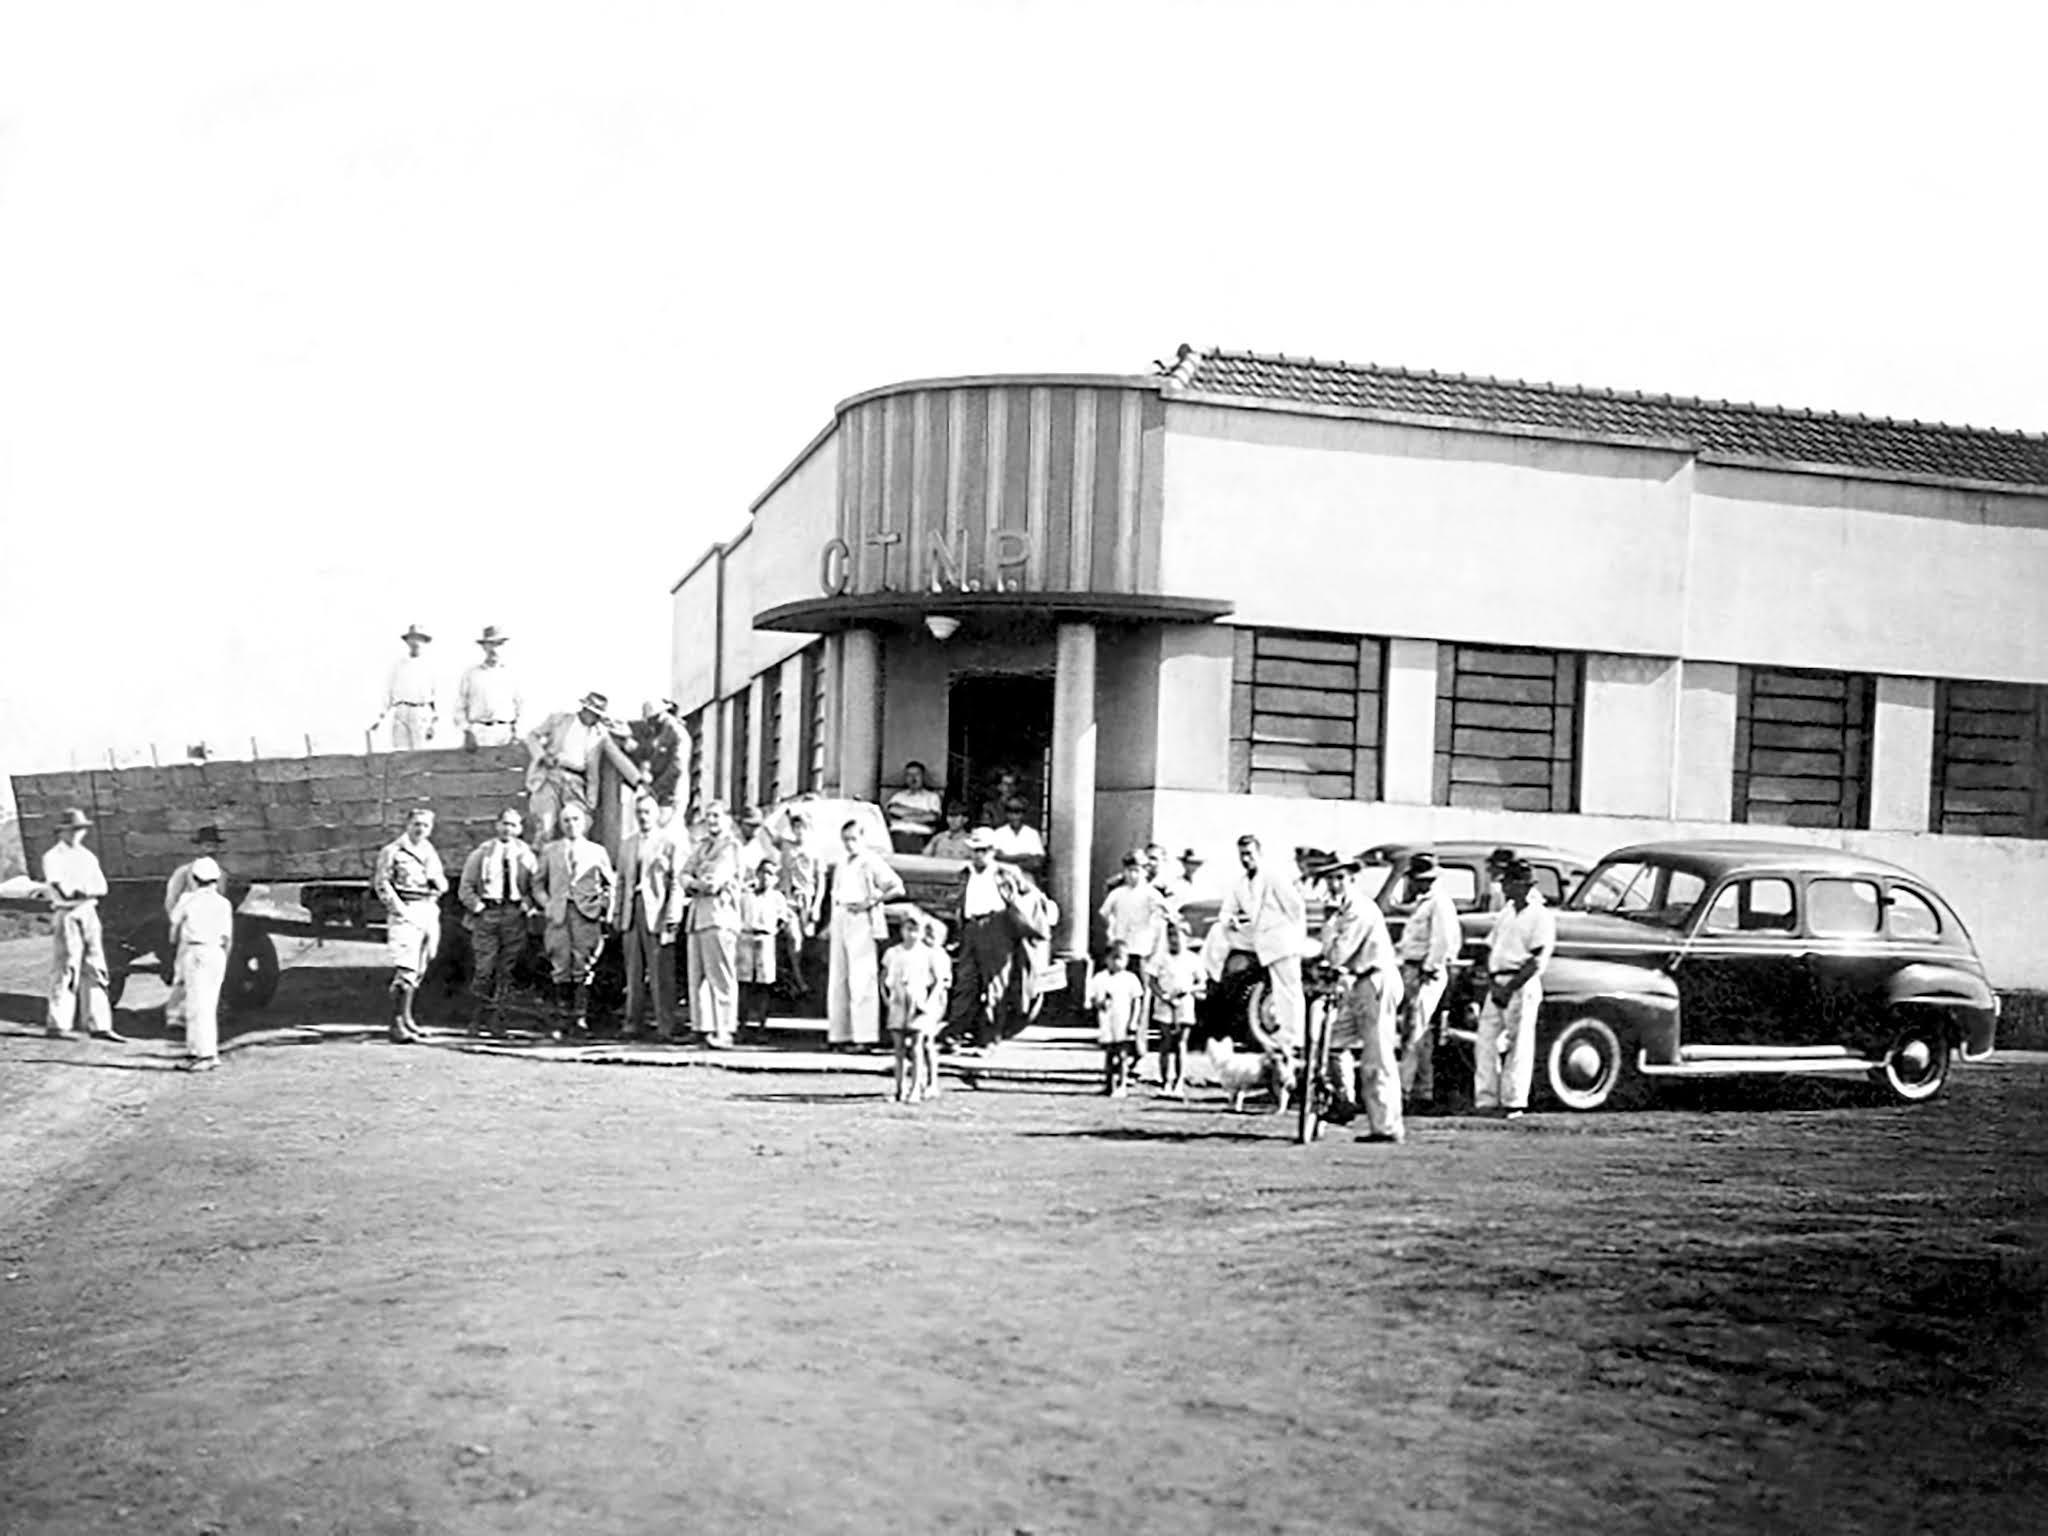 Sede da CTNP - 1948